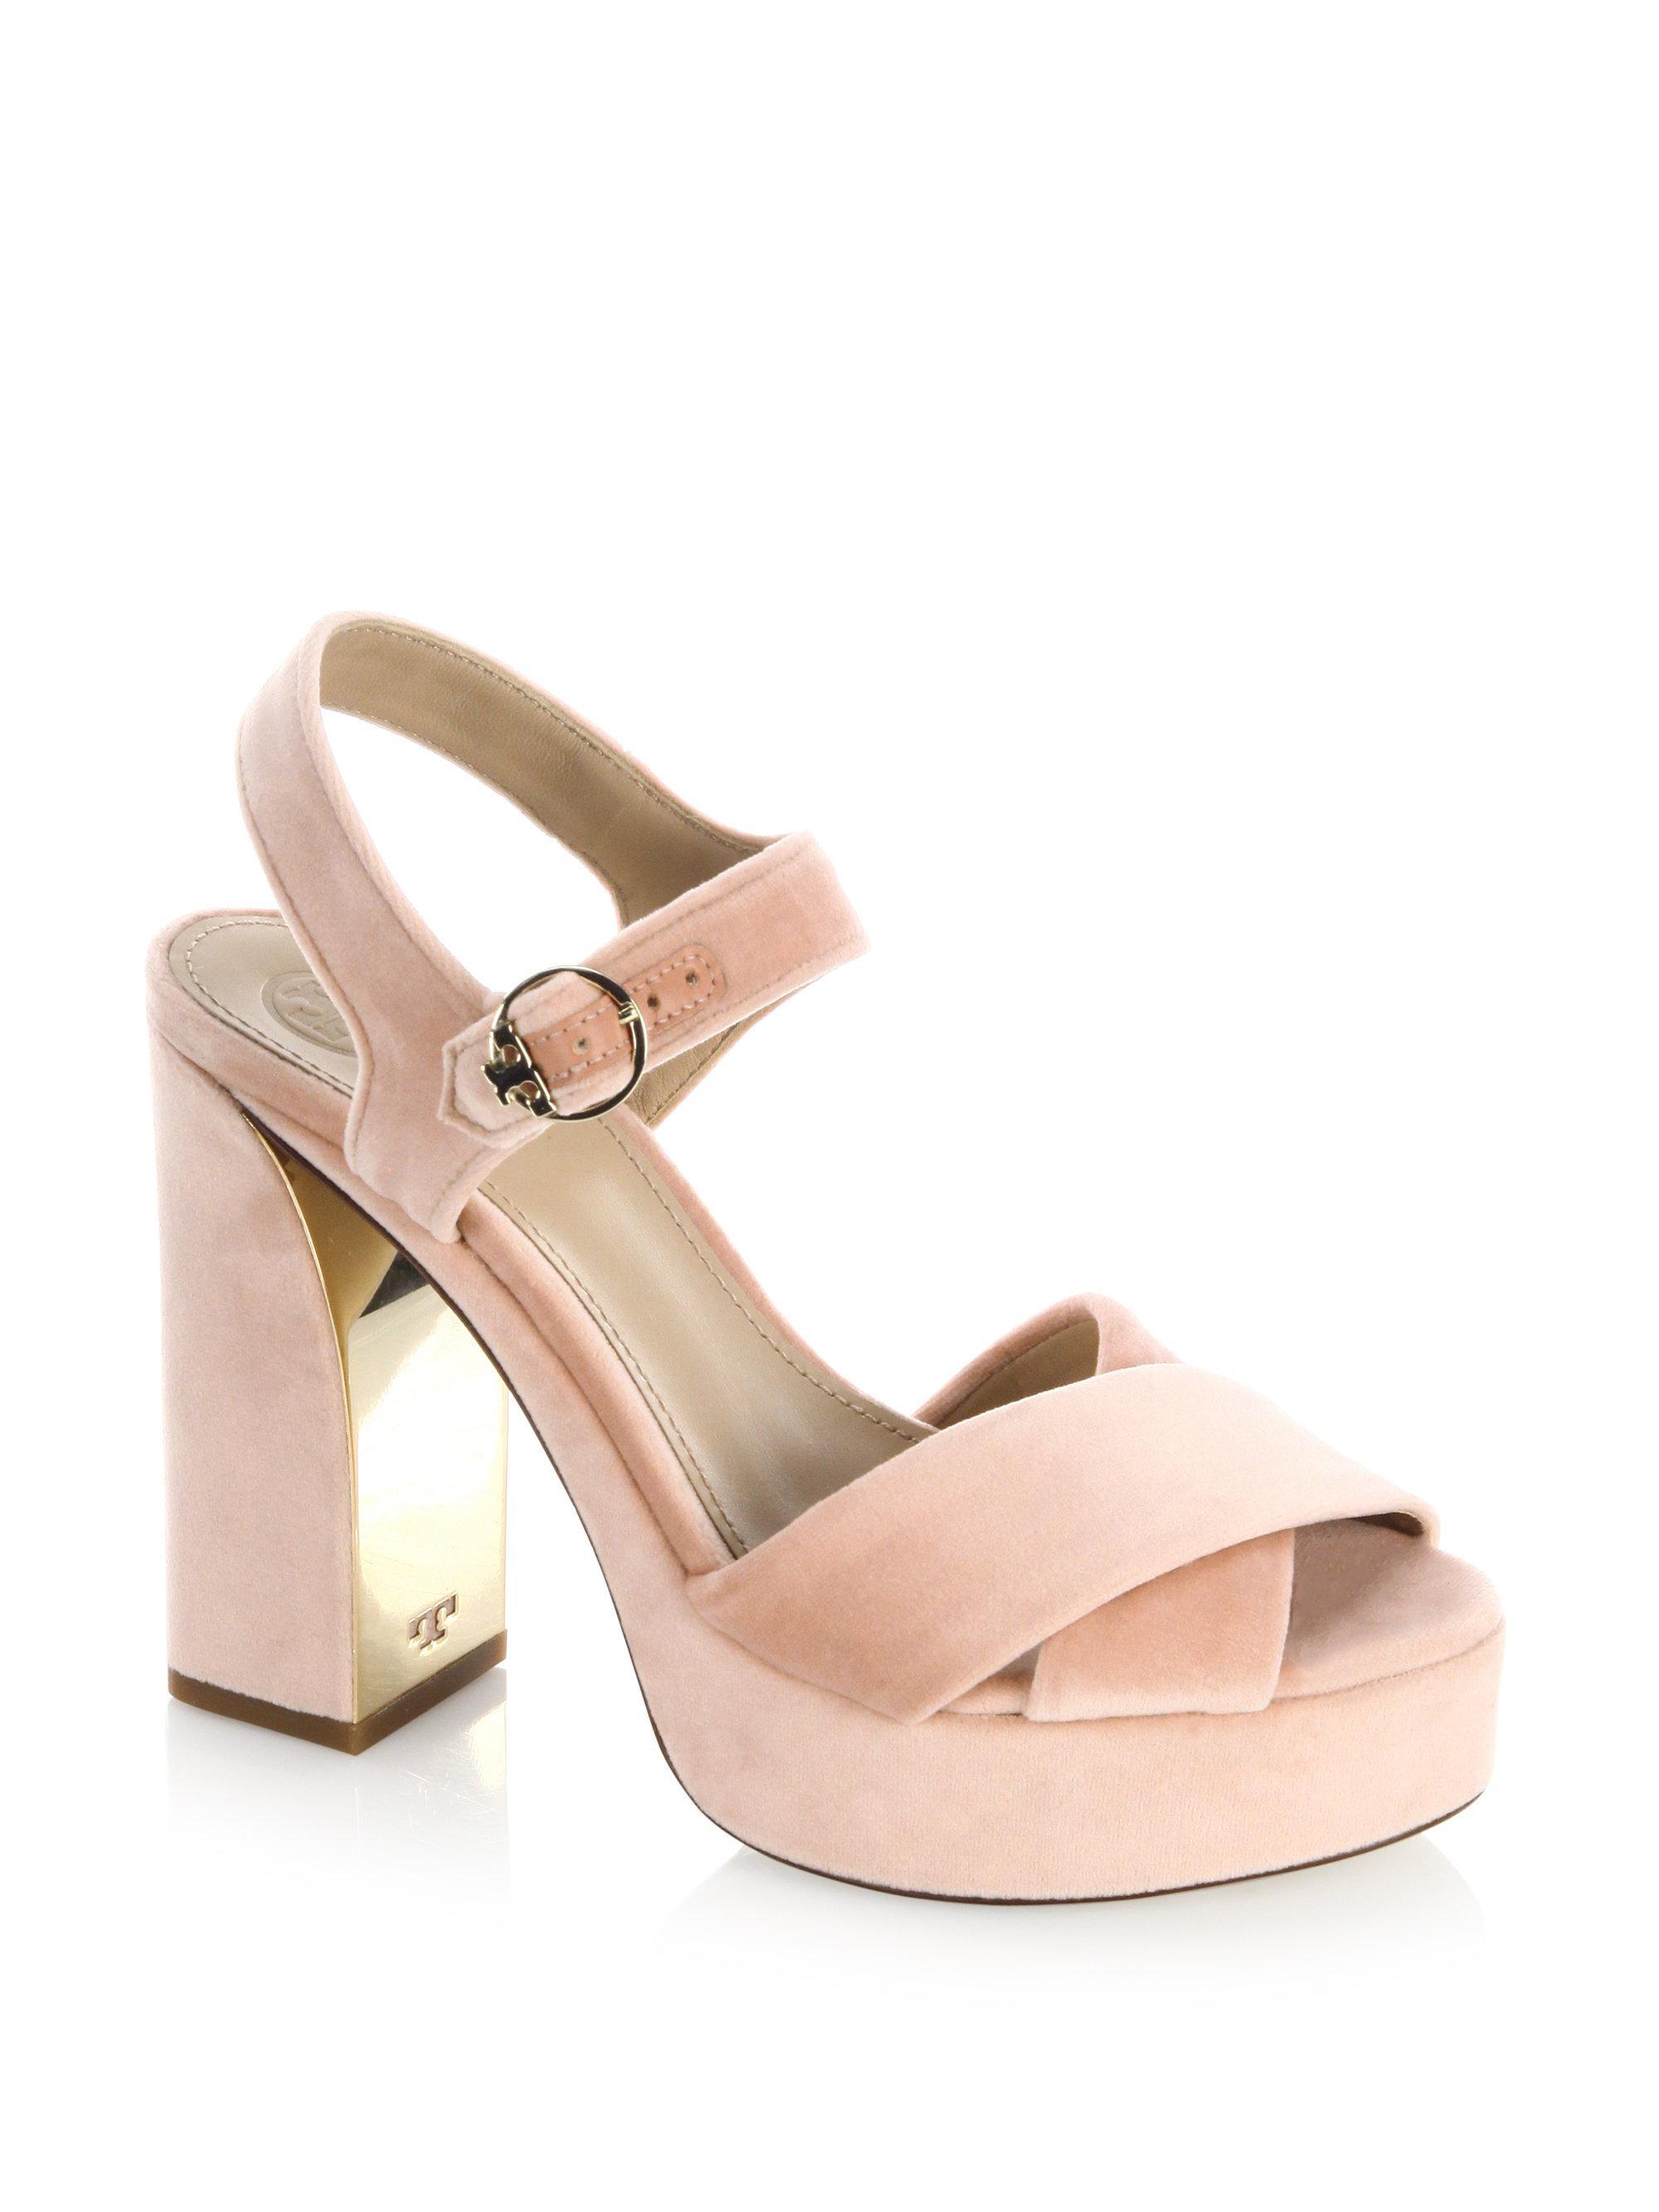 62077708f8bfa Lyst - Tory Burch Loretta Velvet Platform Sandal in Pink